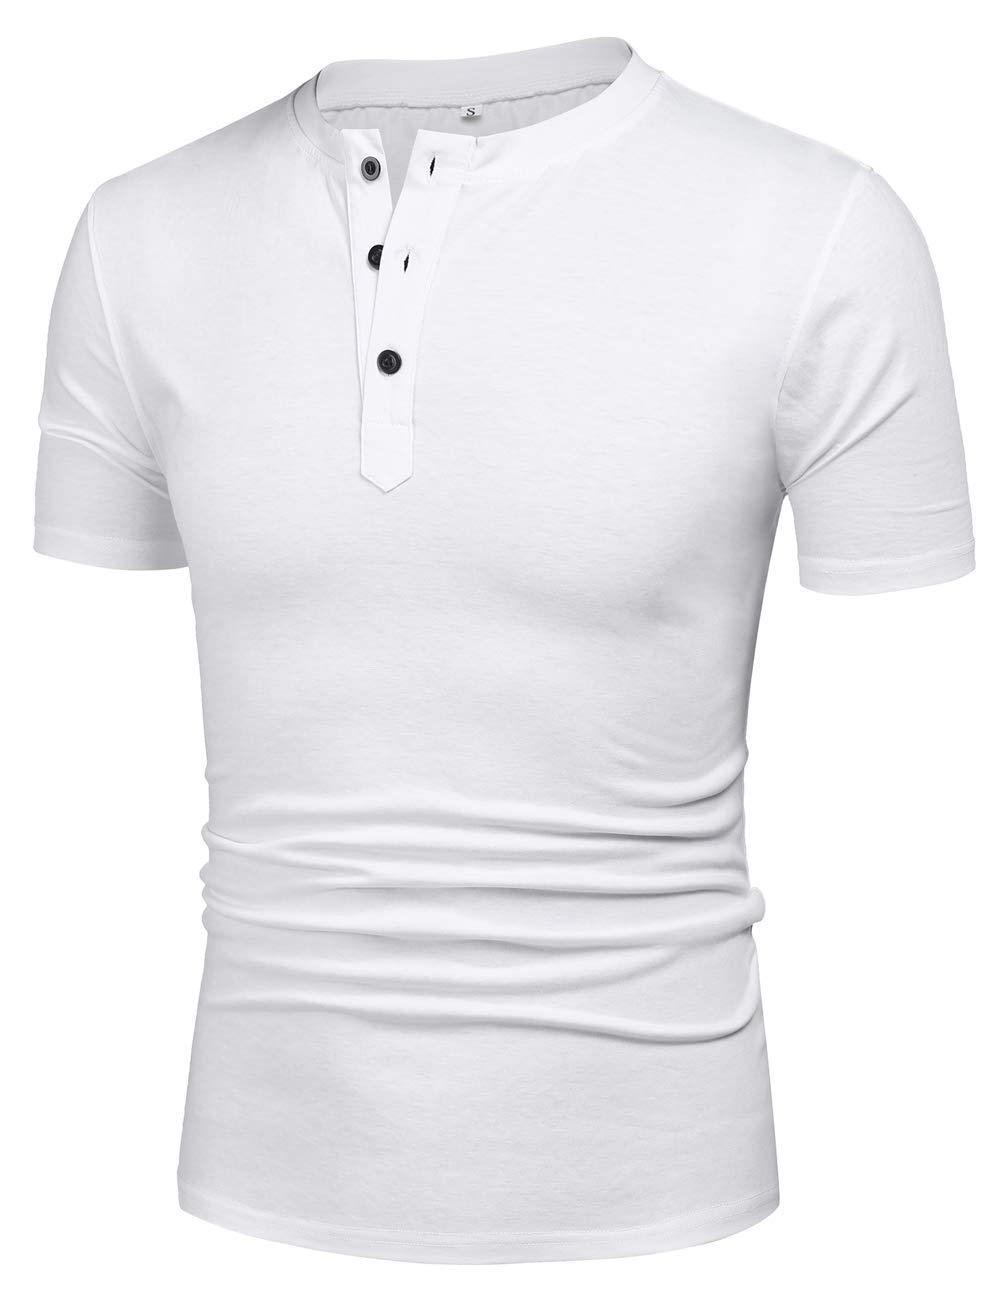 poriff Men Henley Short Sleeve t-Shirt Cotton Henley Shirts Thin Undershirt 3 Button